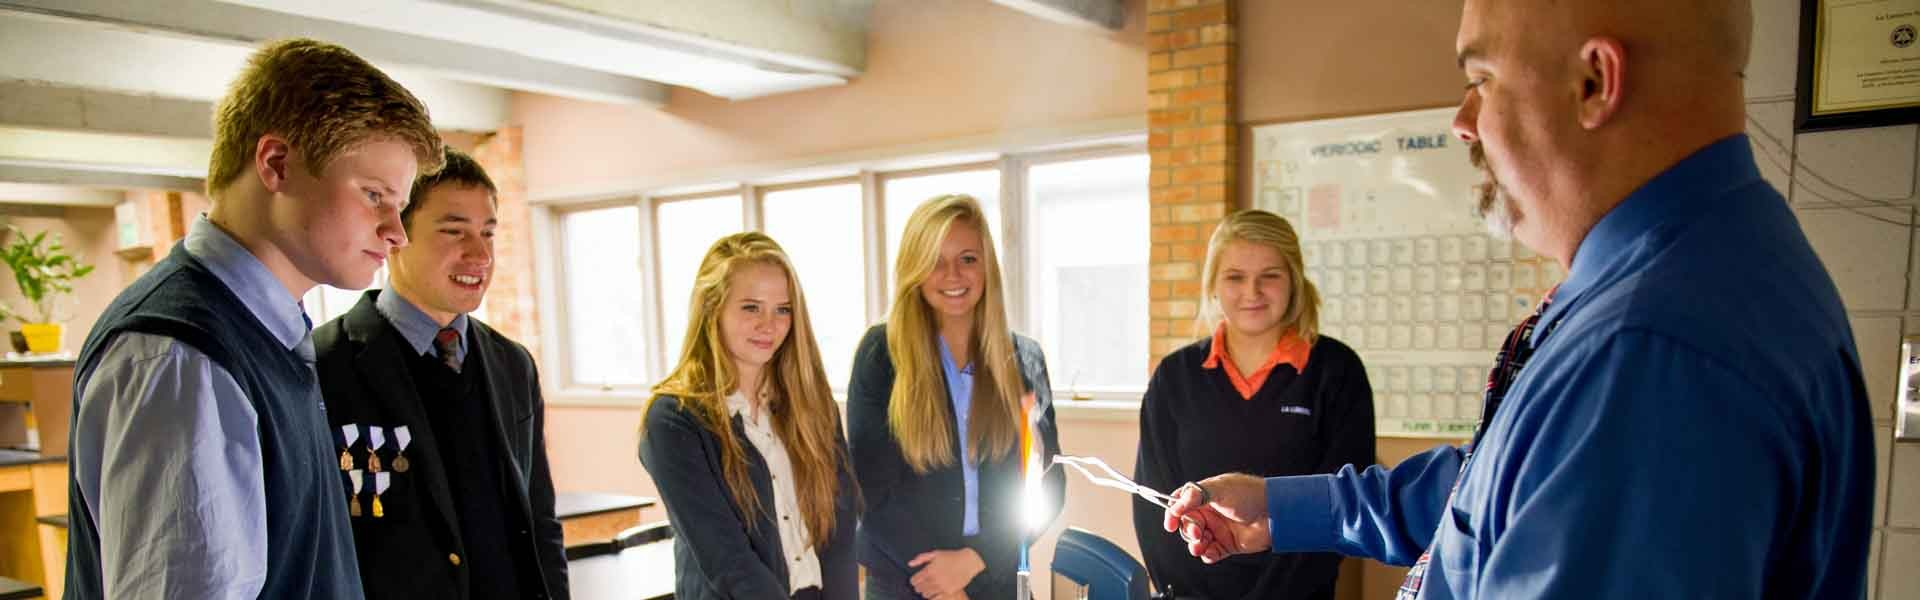 LalumiereSchool-Highschool-Indiana-ChemistryClass-MAin-BAnner-2019